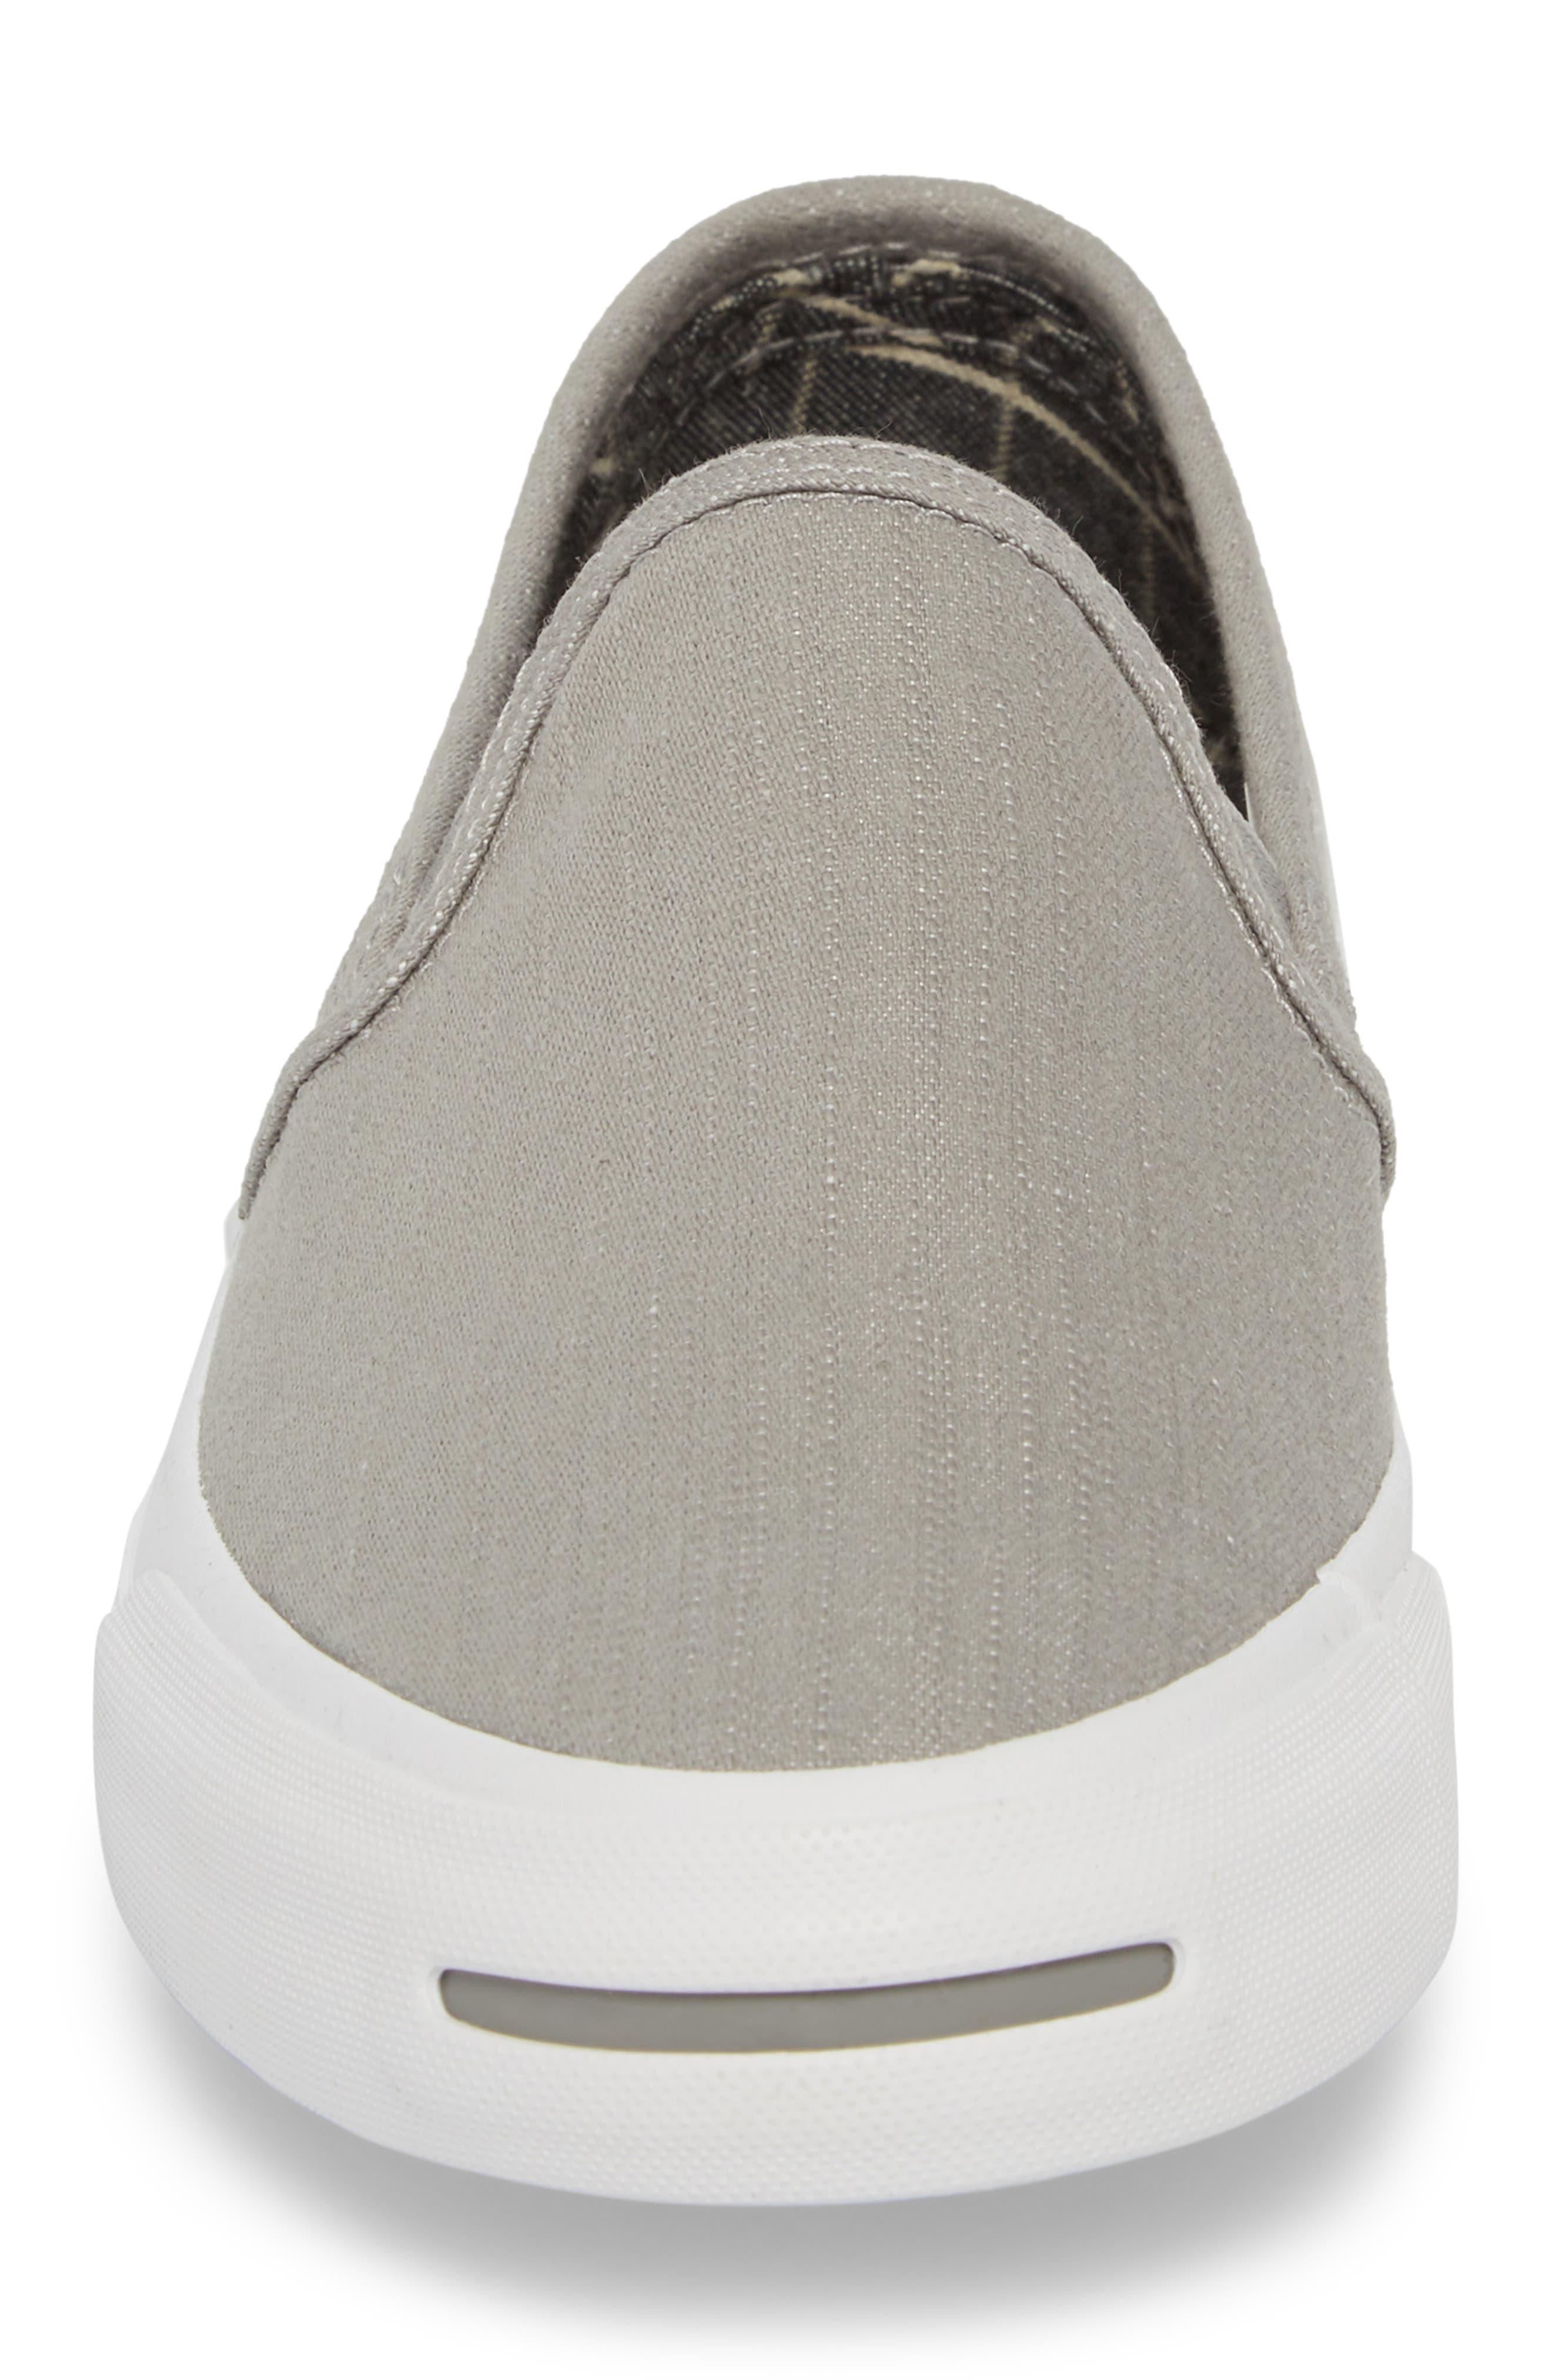 Jack Purcell Low Profile Slip-On Sneaker,                             Alternate thumbnail 4, color,                             020